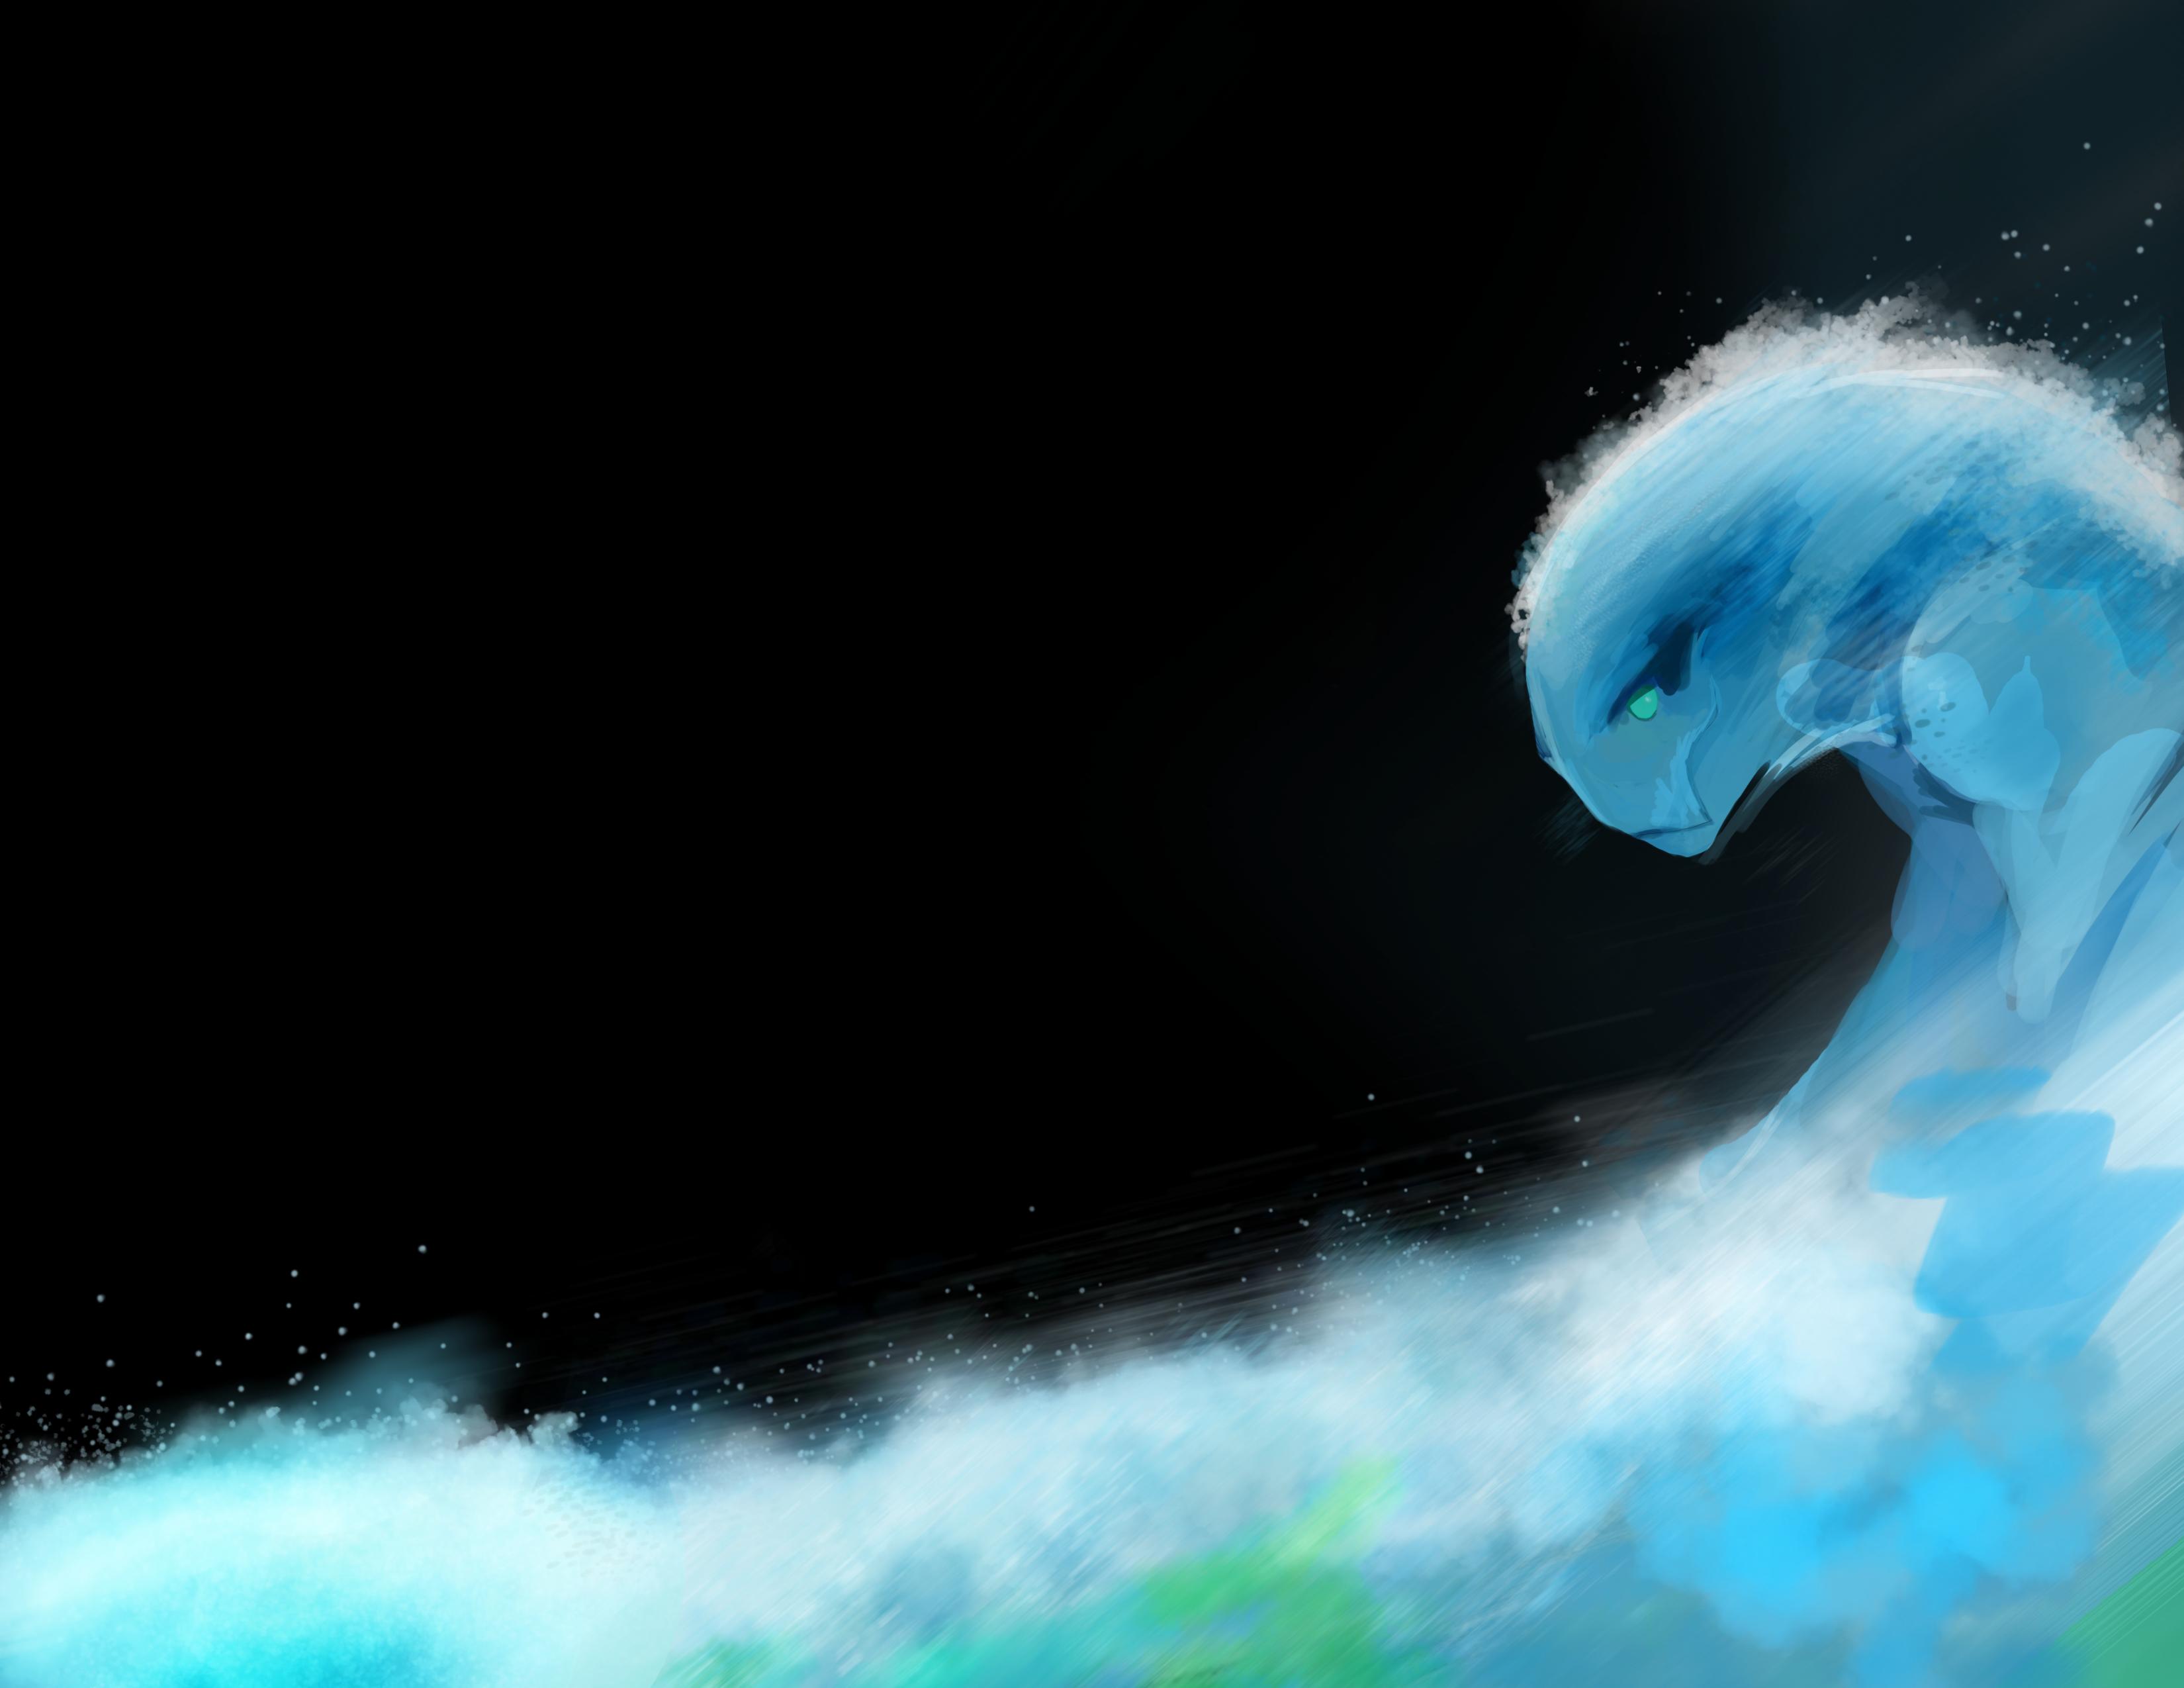 A Quick Morphling Painting DotA2 3300x2550